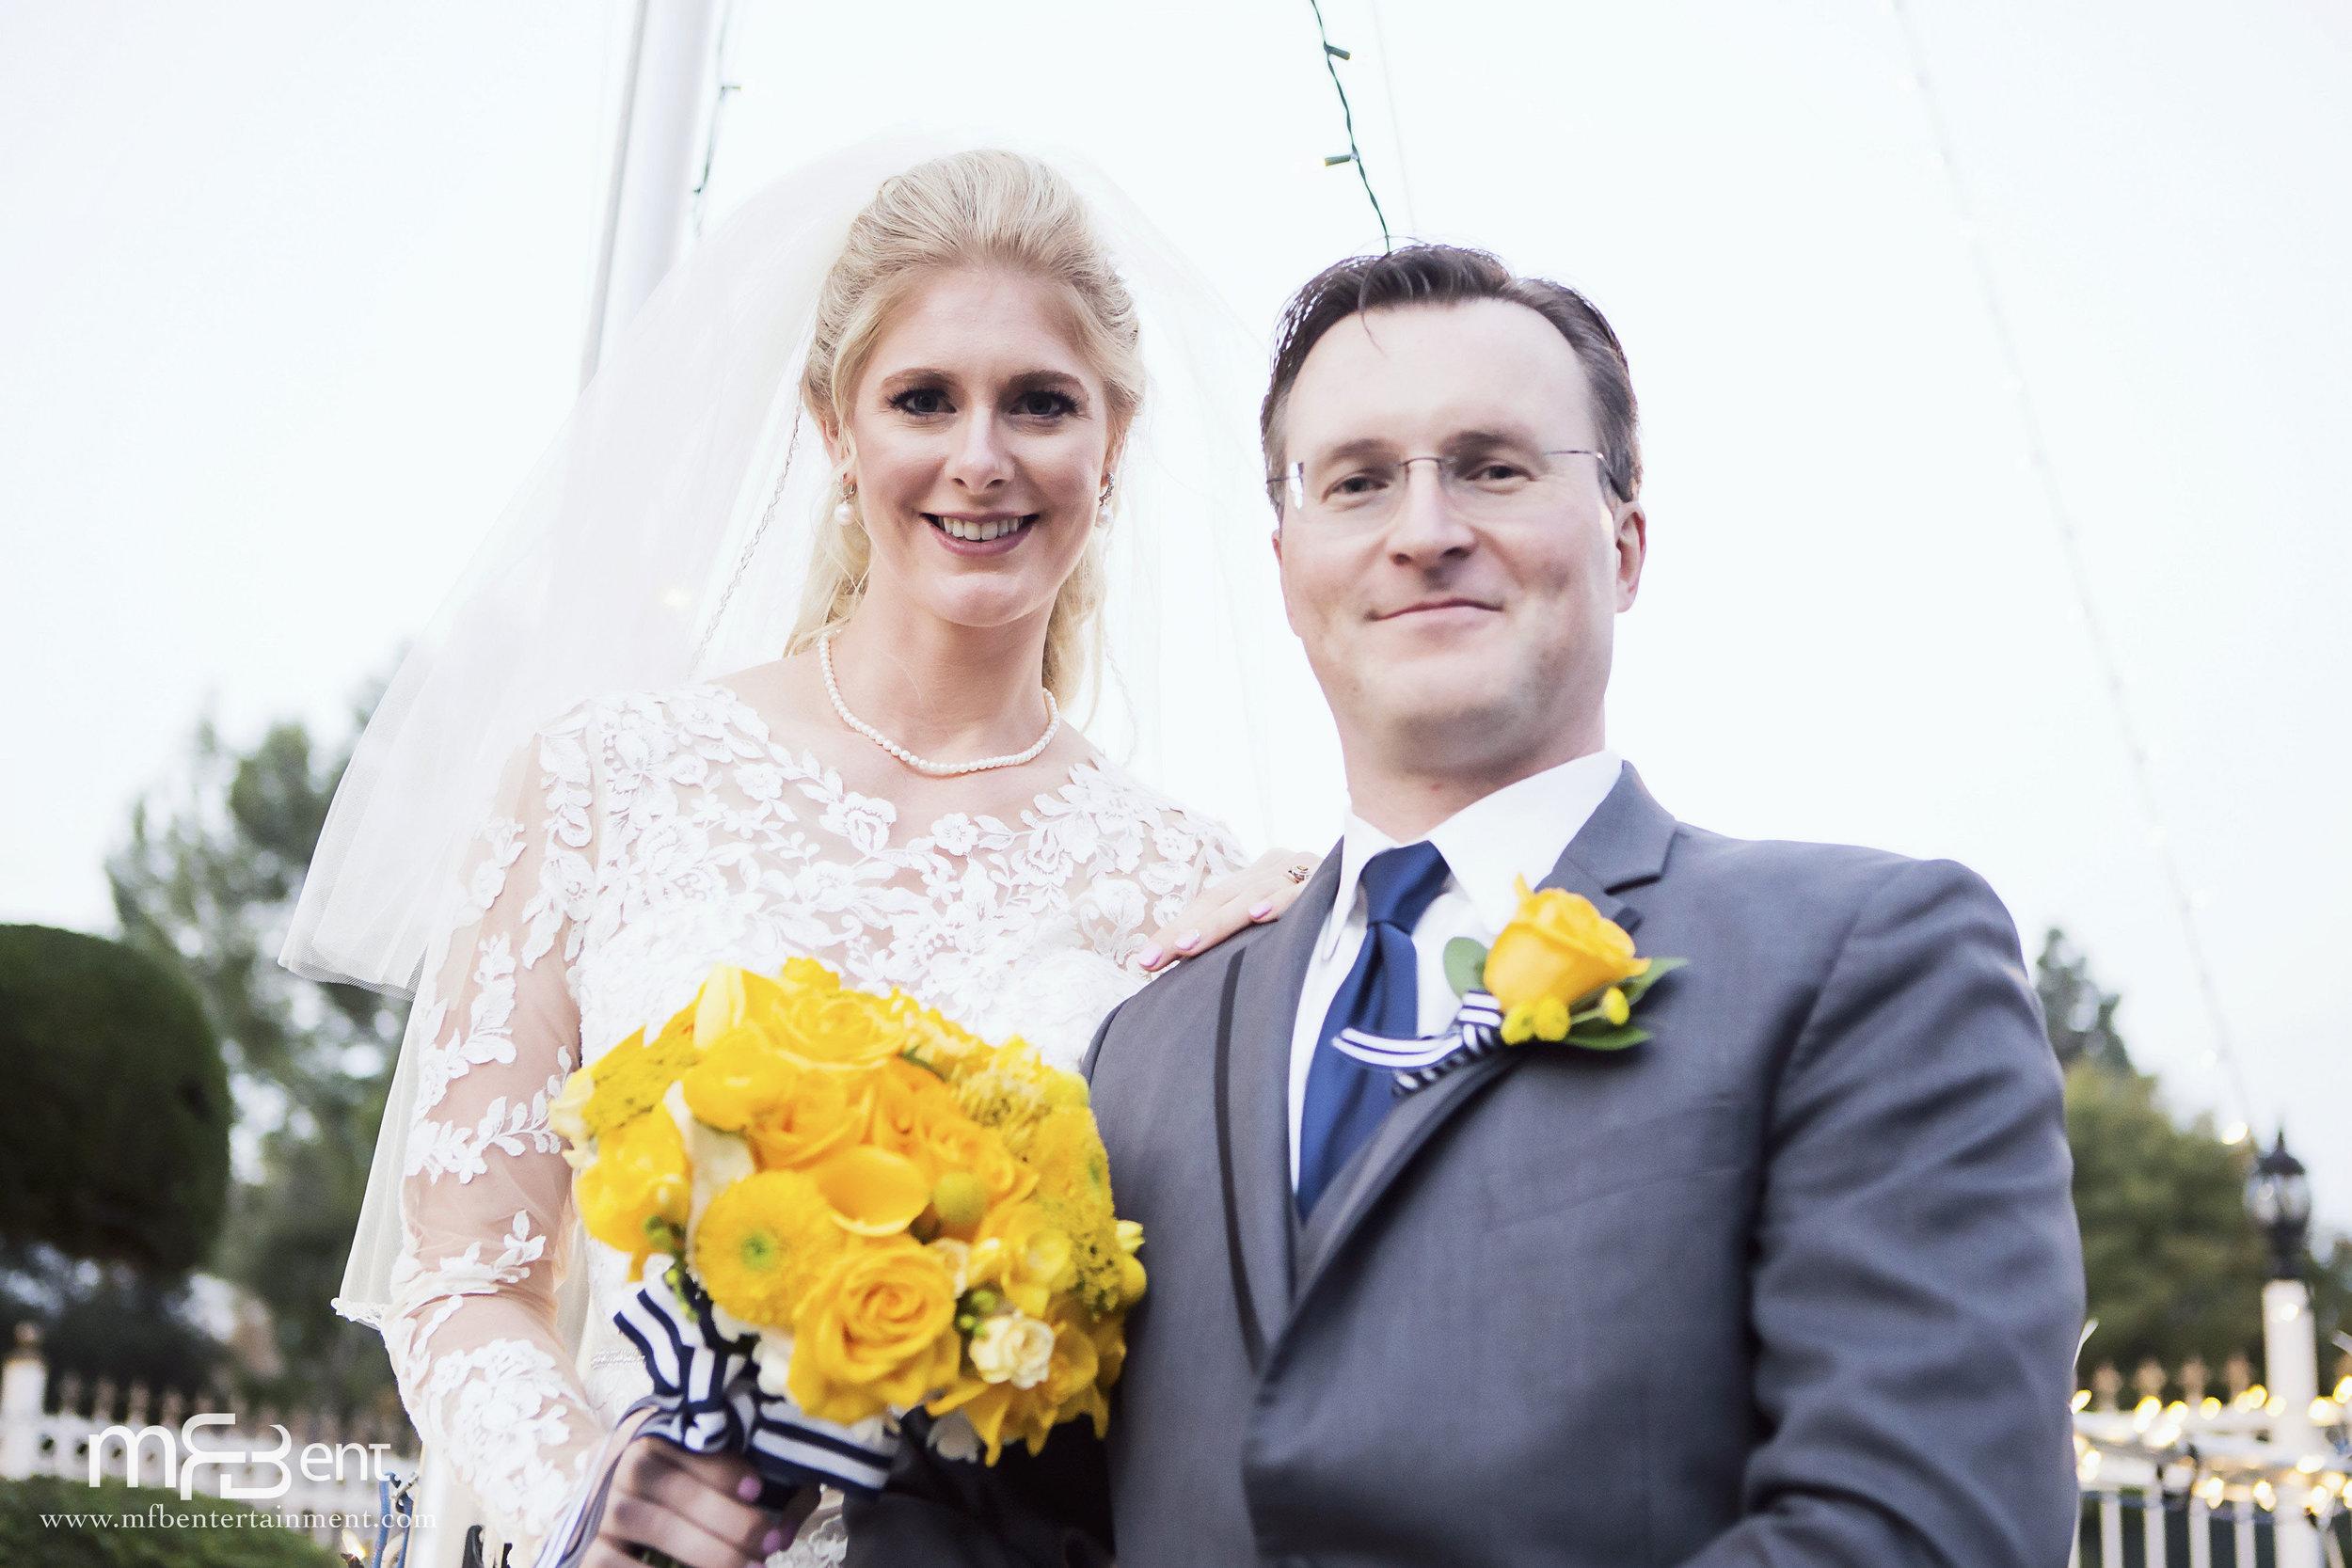 PIOTR CHELSEA WEDDING-PHOTO SESSION-0038 L.jpg